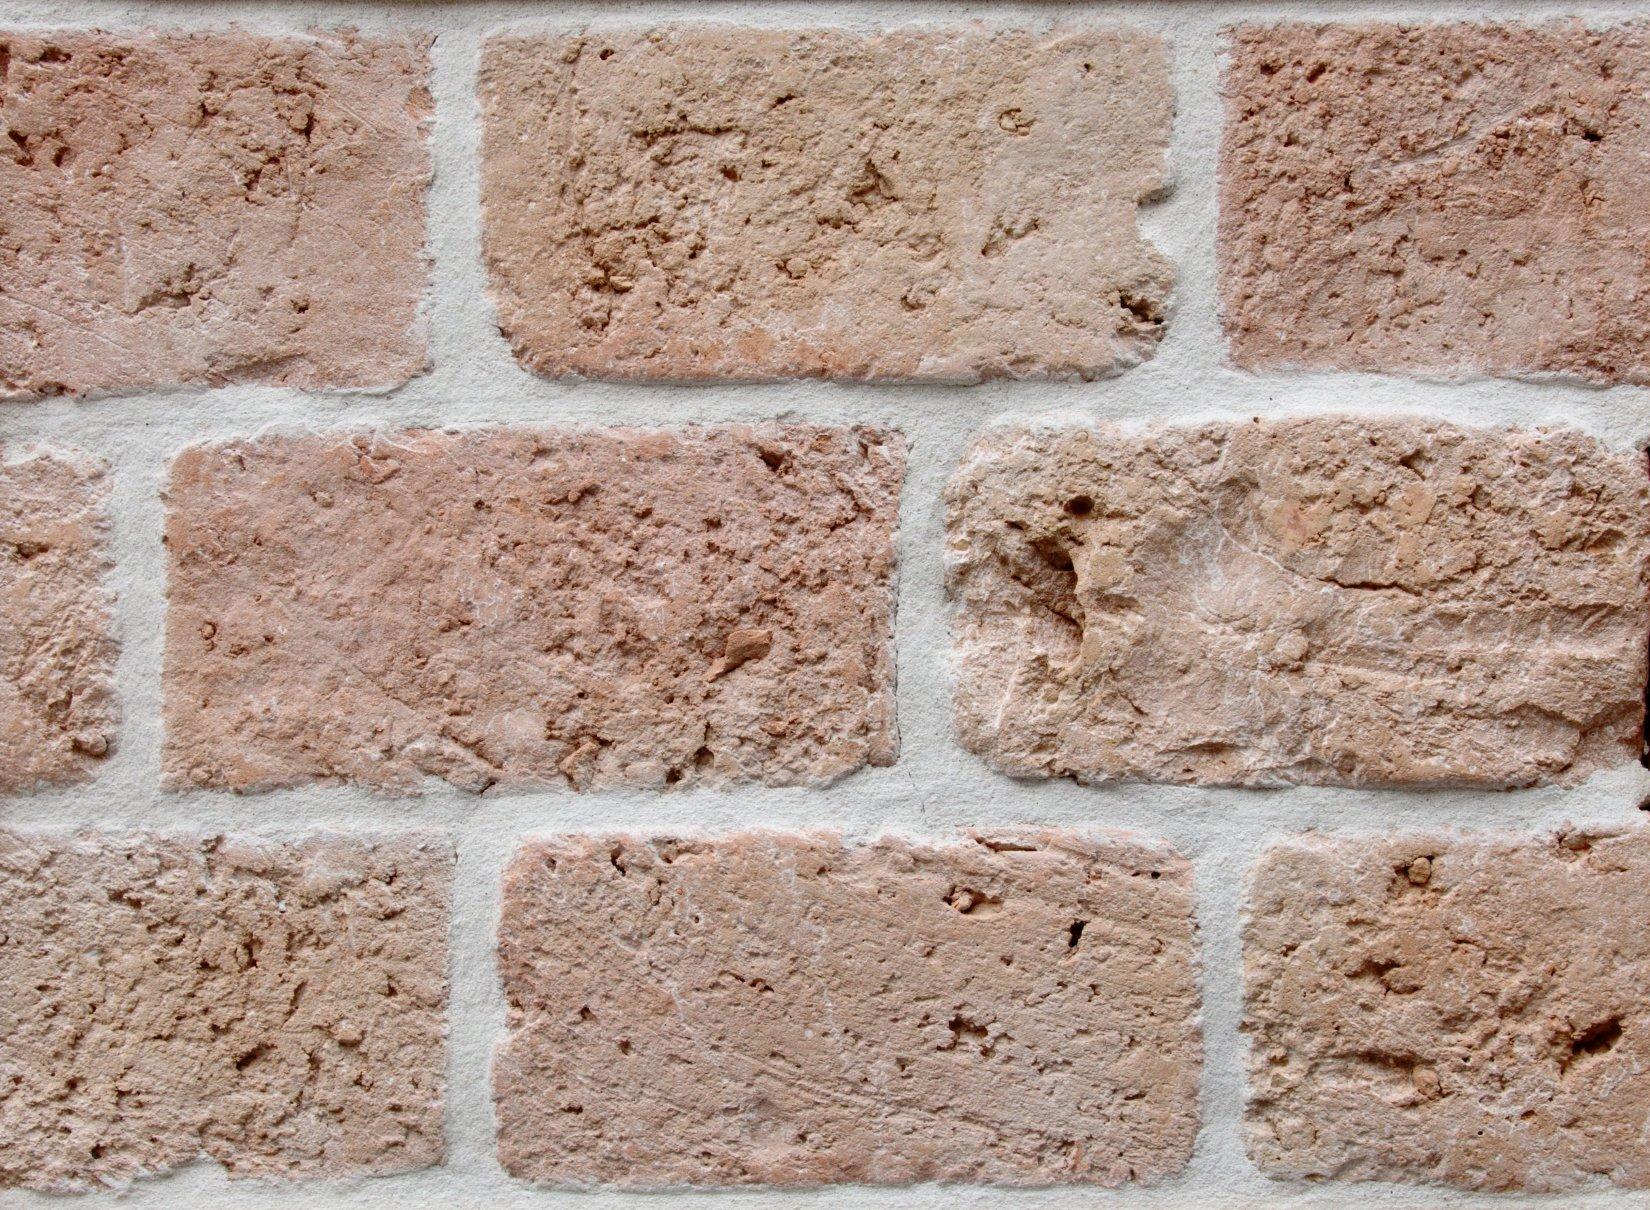 Brick Texture, Rockwall, Rock, Rough, Row, HQ Photo